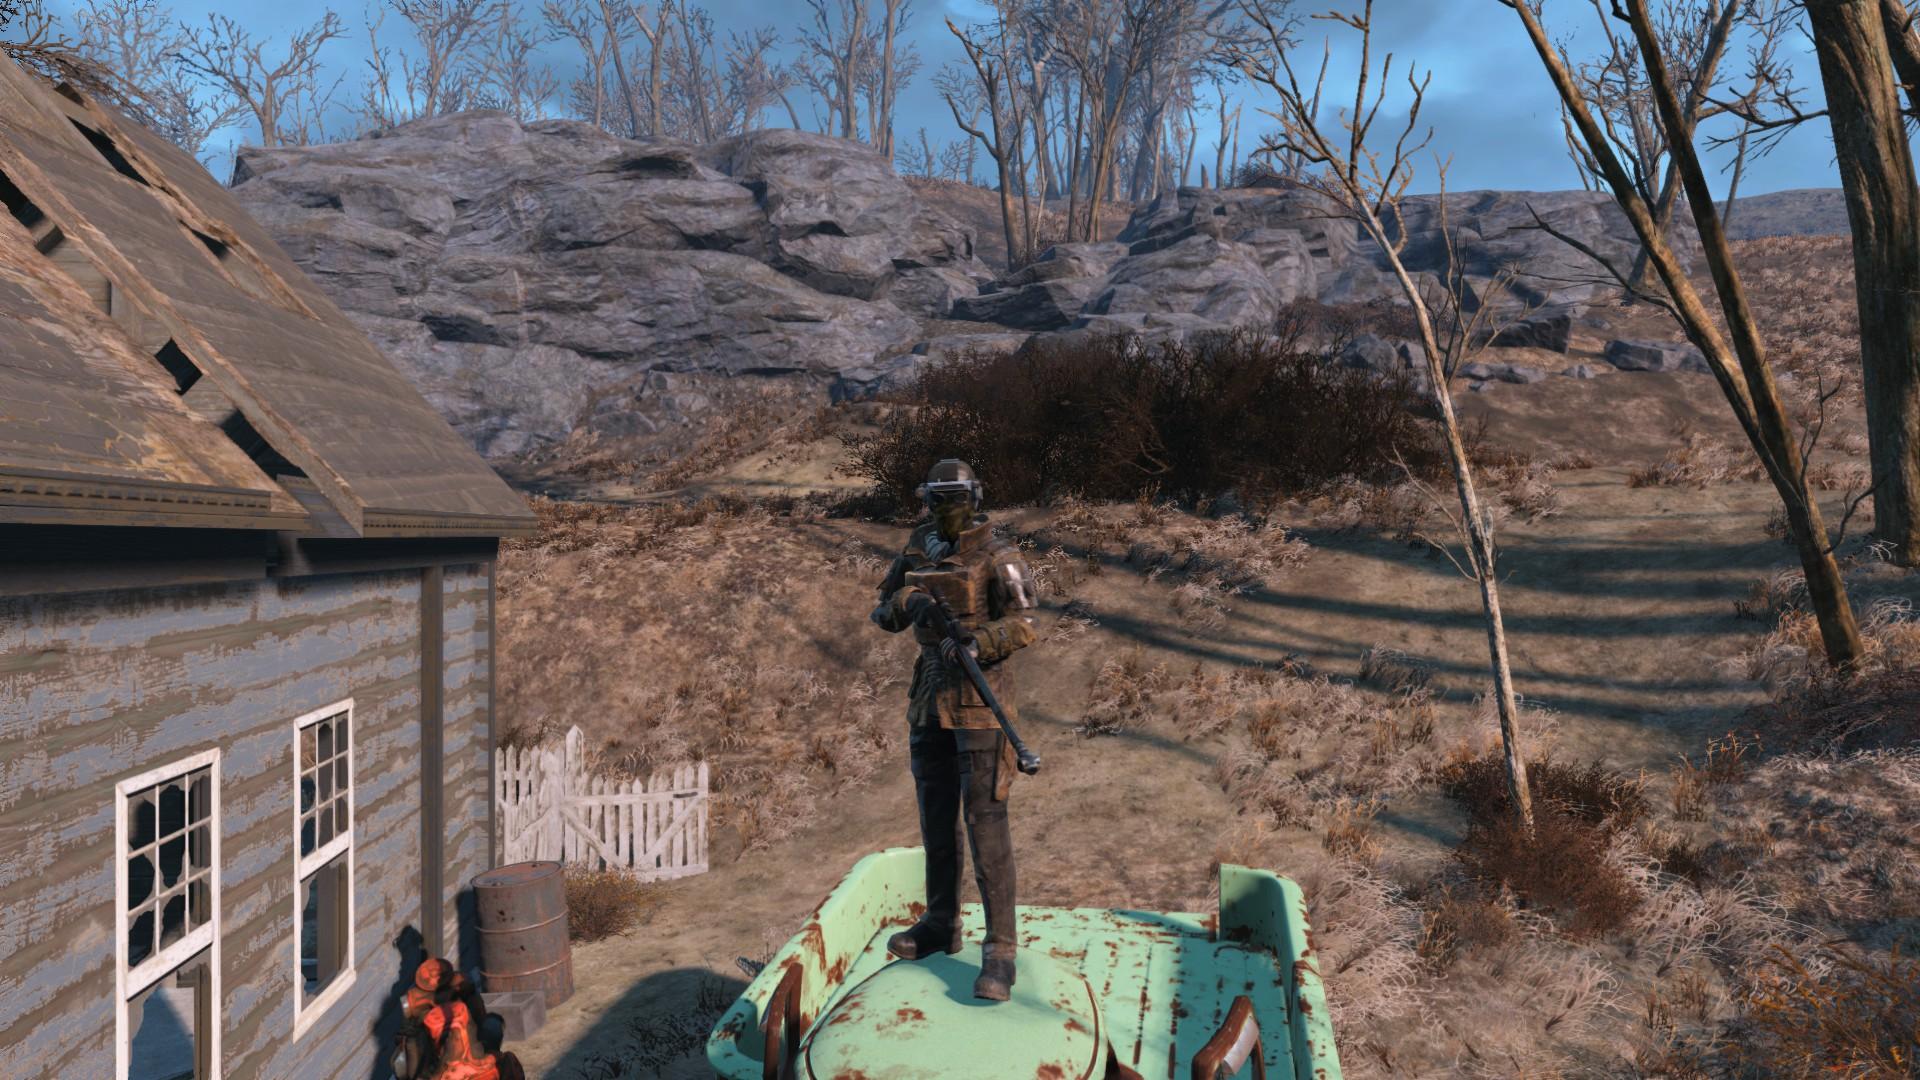 20170827185031_1.jpg - Fallout 4